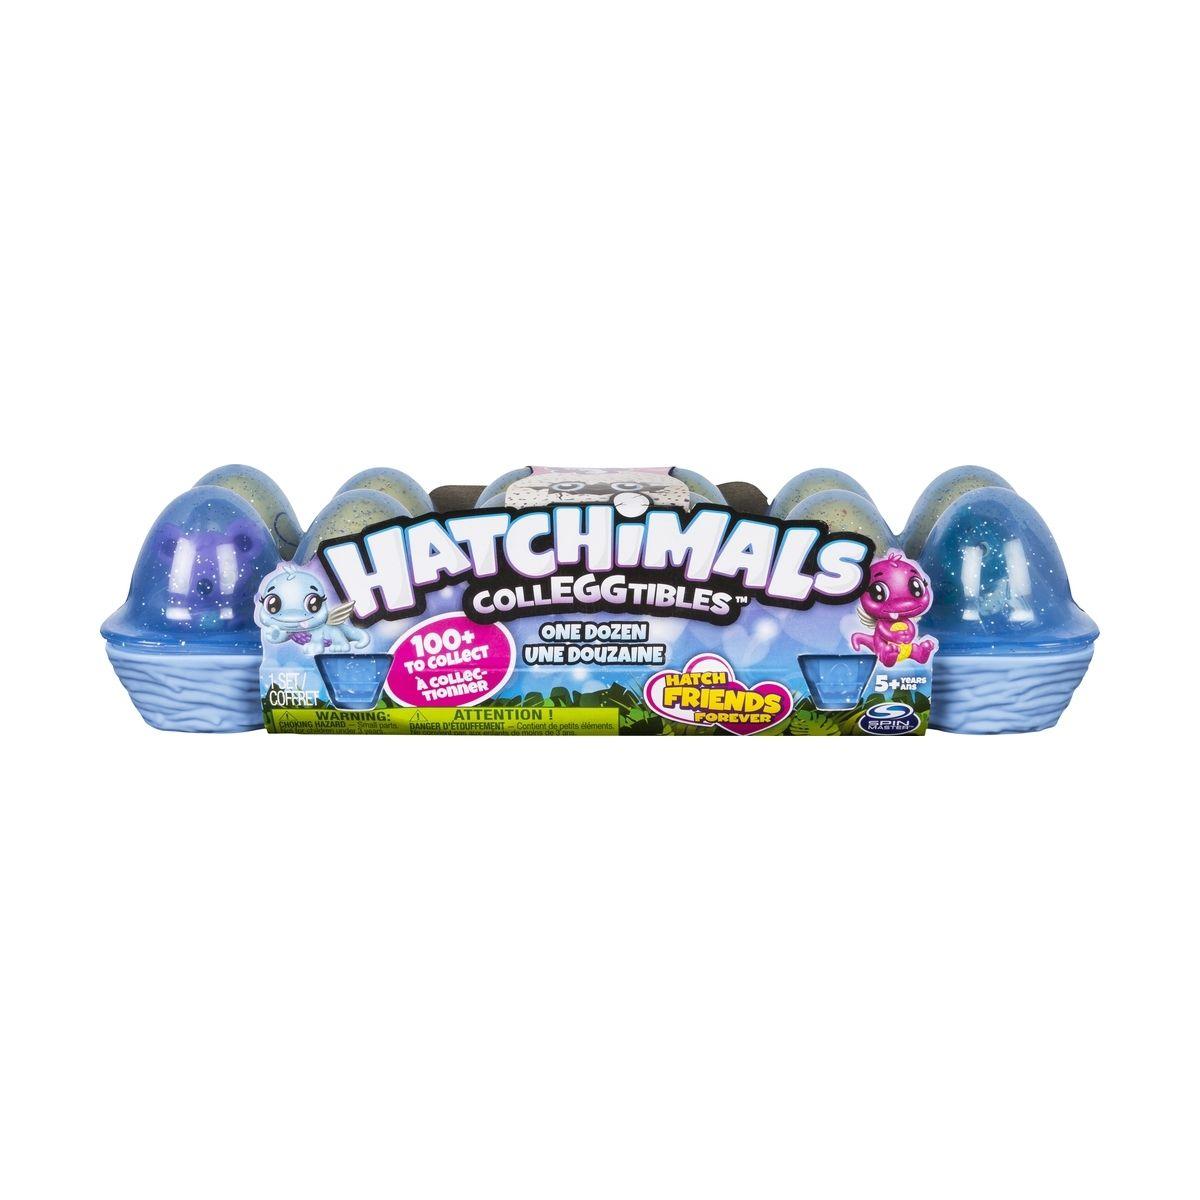 Hatchimals Colleggtibles 12 Pack Egg Carton Kmart Hatchimals